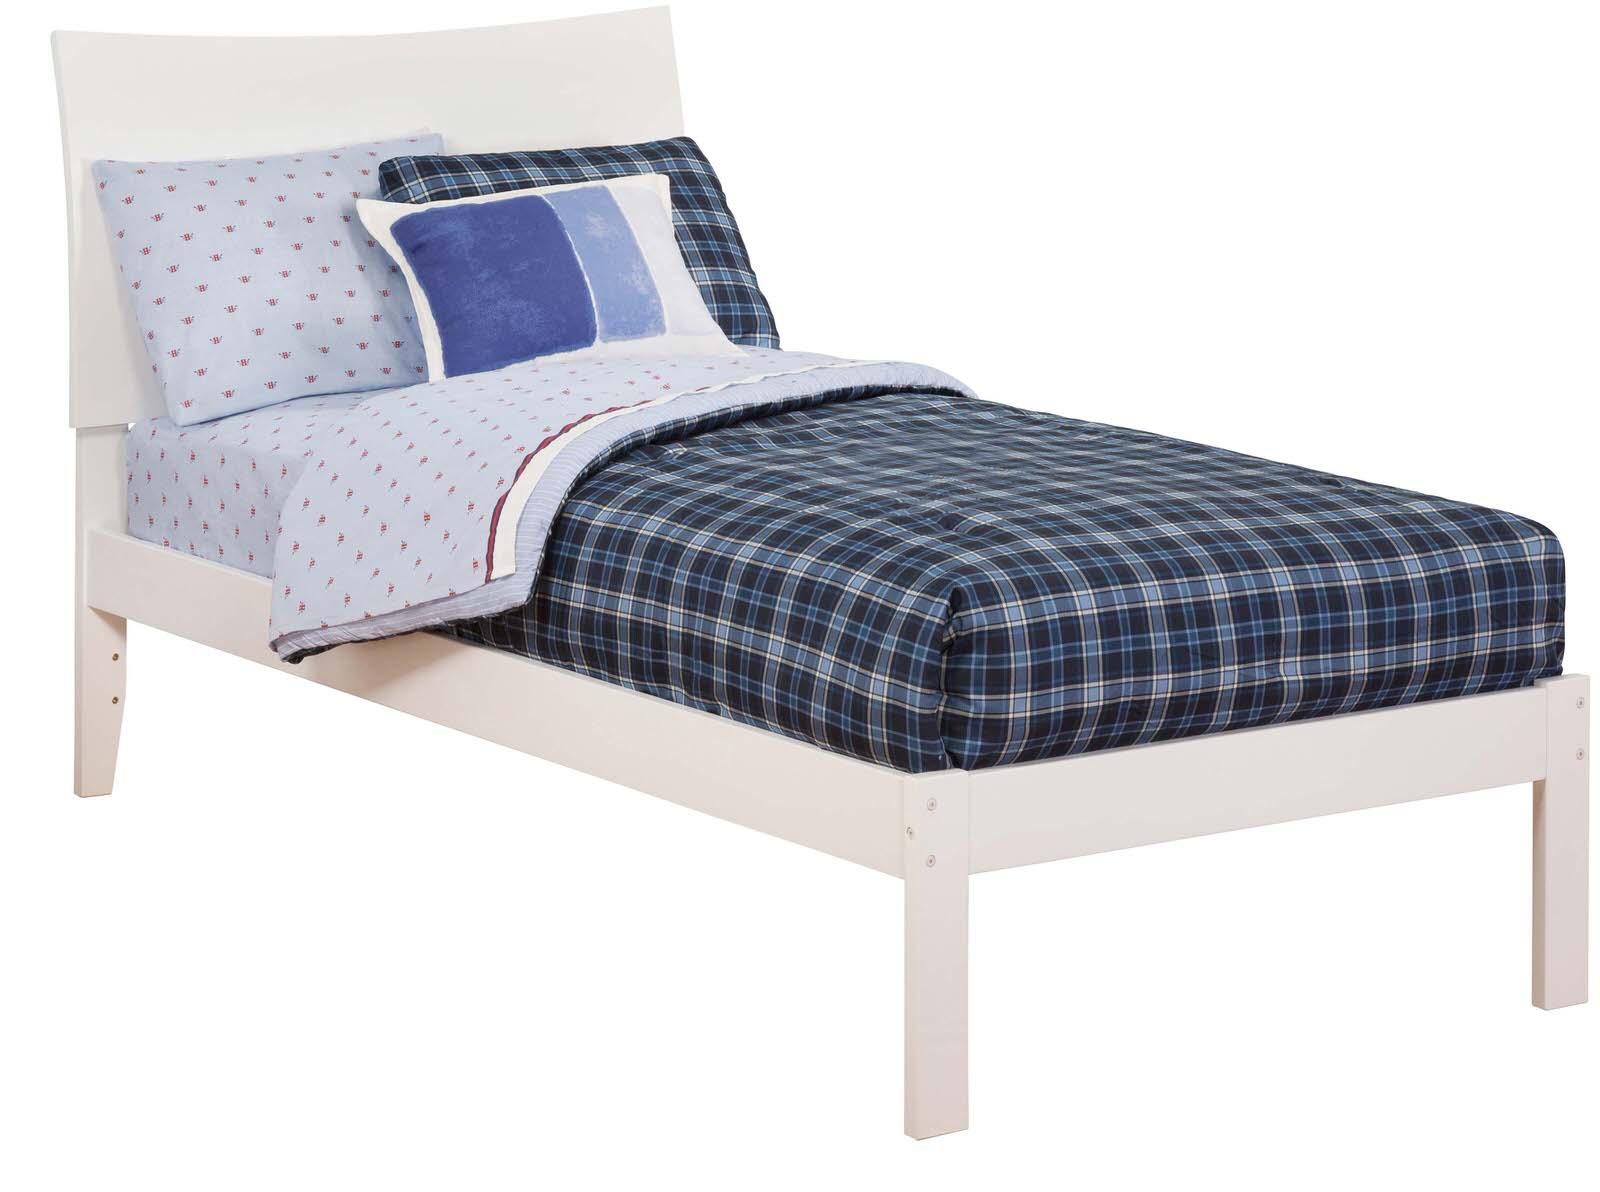 Soho Platform Bed with Mattress Set